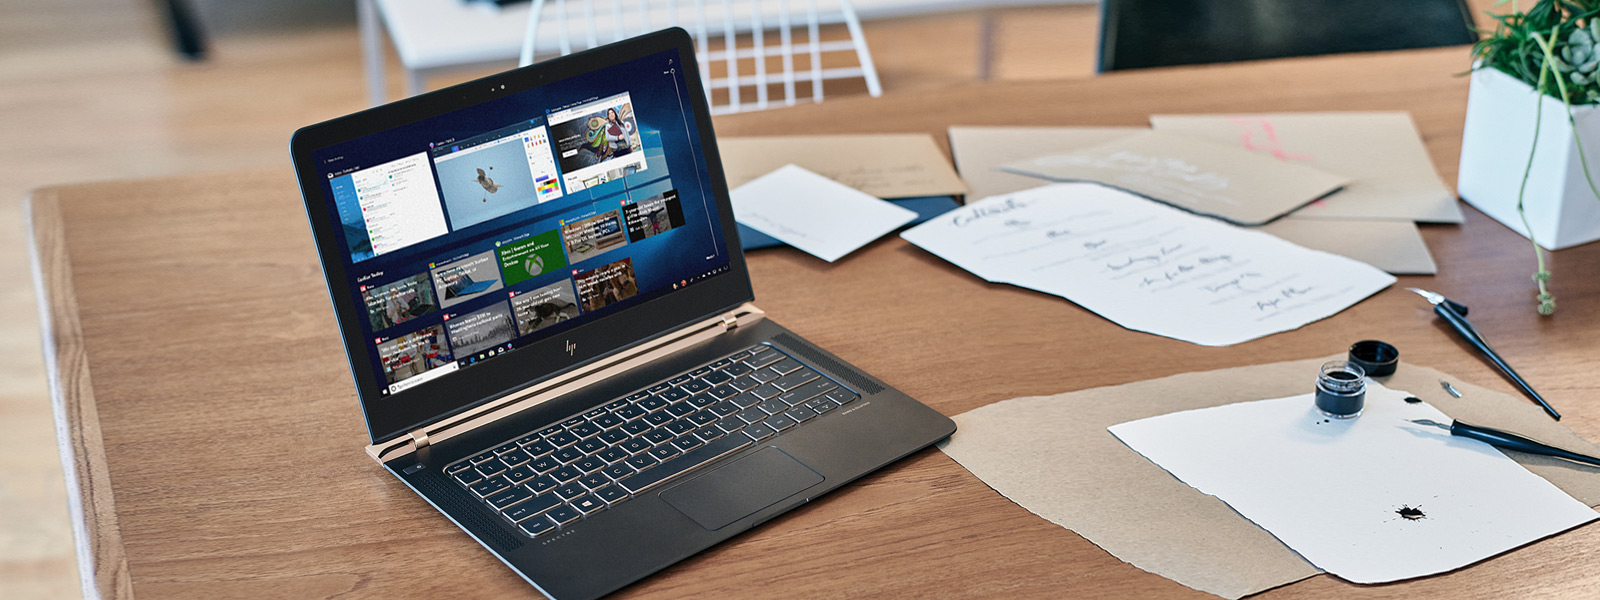 Windows Timeline на экране ноутбука, стоящего на столе